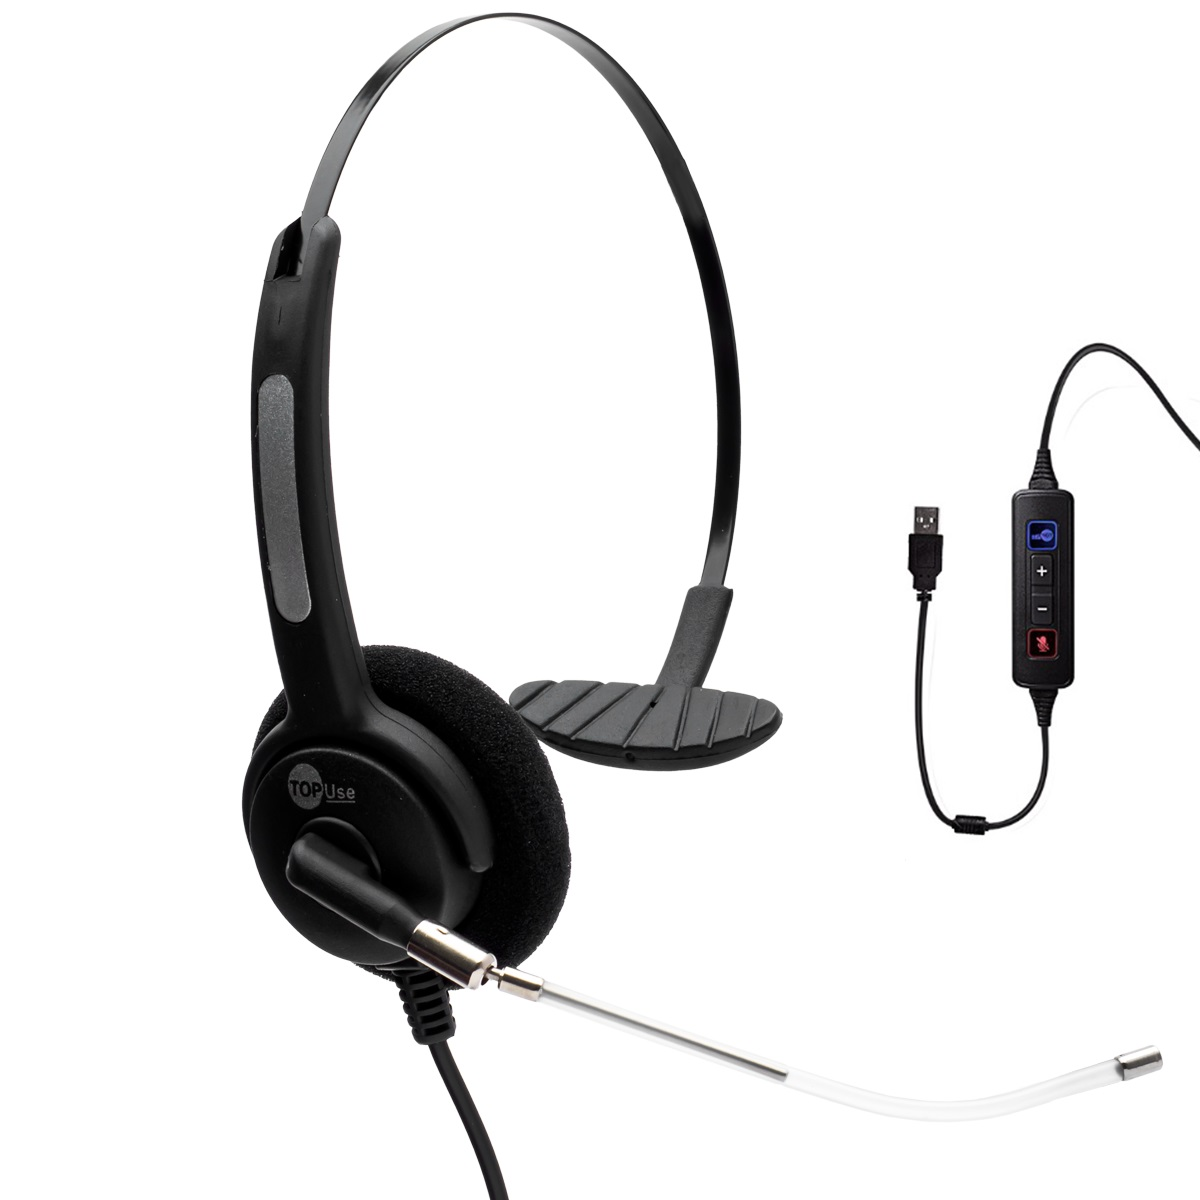 Headset USB Voip c/ Tubo de Voz Removível HTU-310 - TopUse